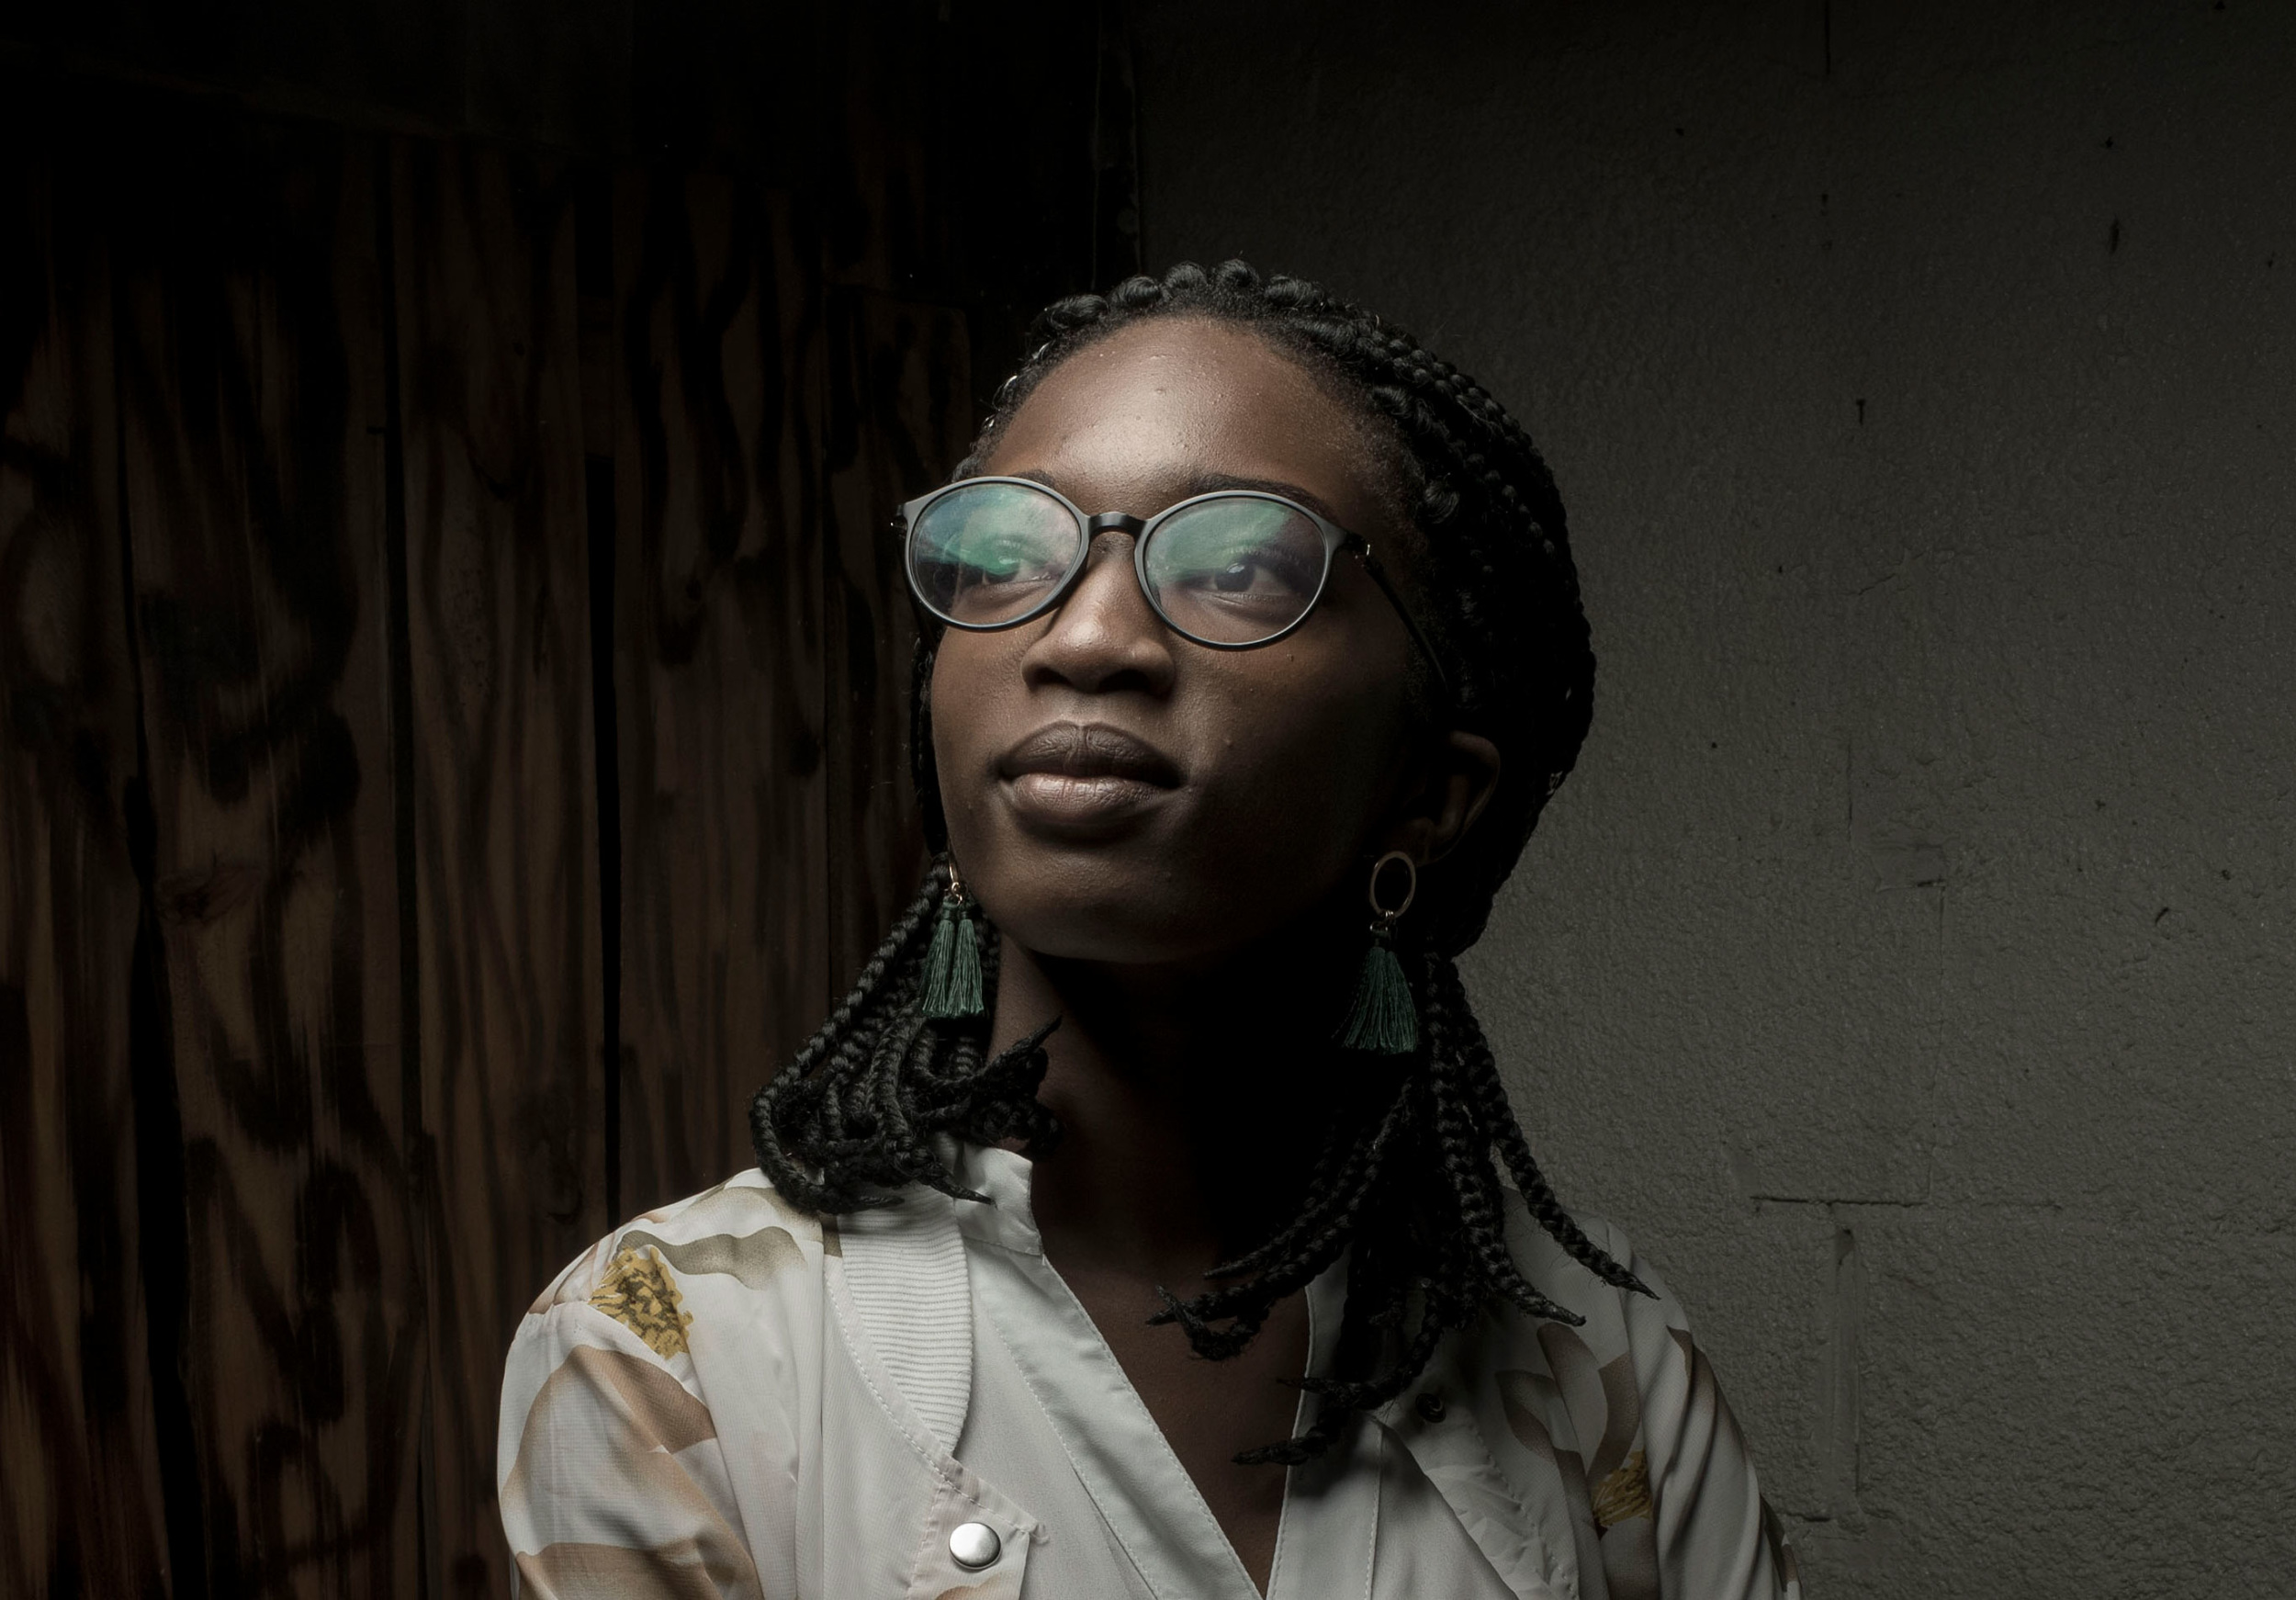 Dominique Alonga is the founder and CEO of Imagine We Rwanda. All photos: Josh Estey/CARE